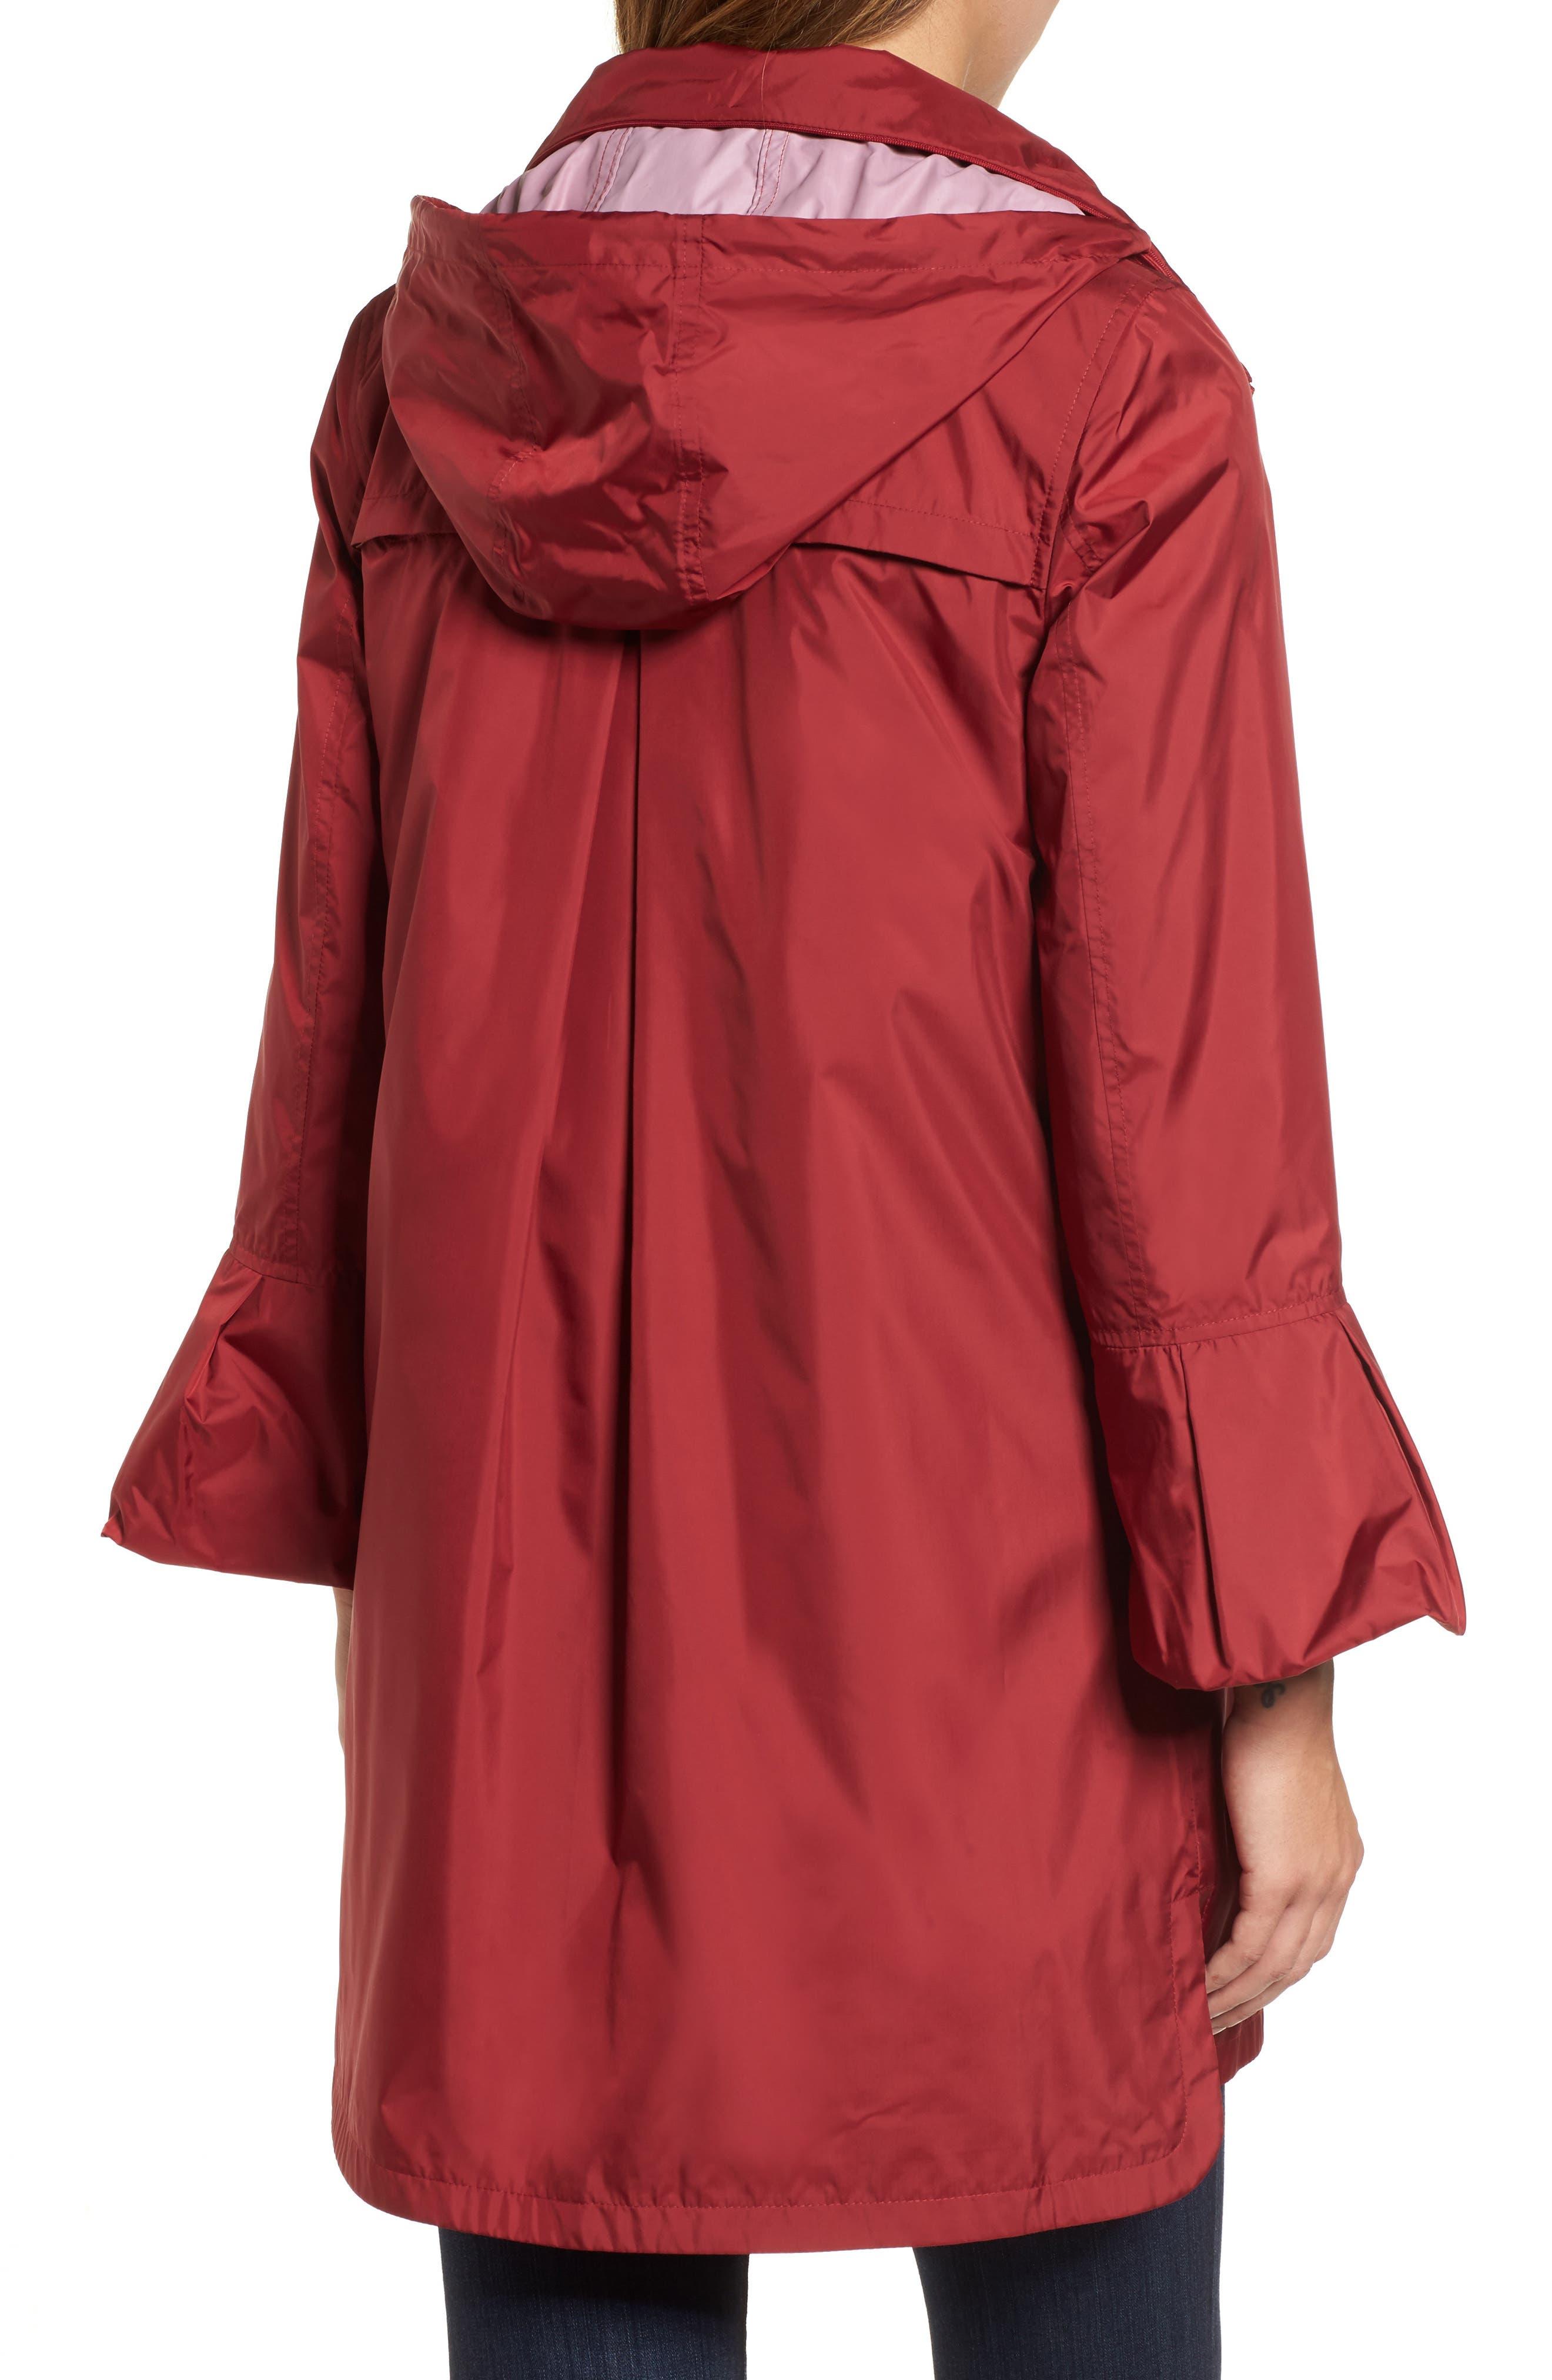 Flare Sleeve Packable Swing Jacket,                             Alternate thumbnail 2, color,                             Garnet